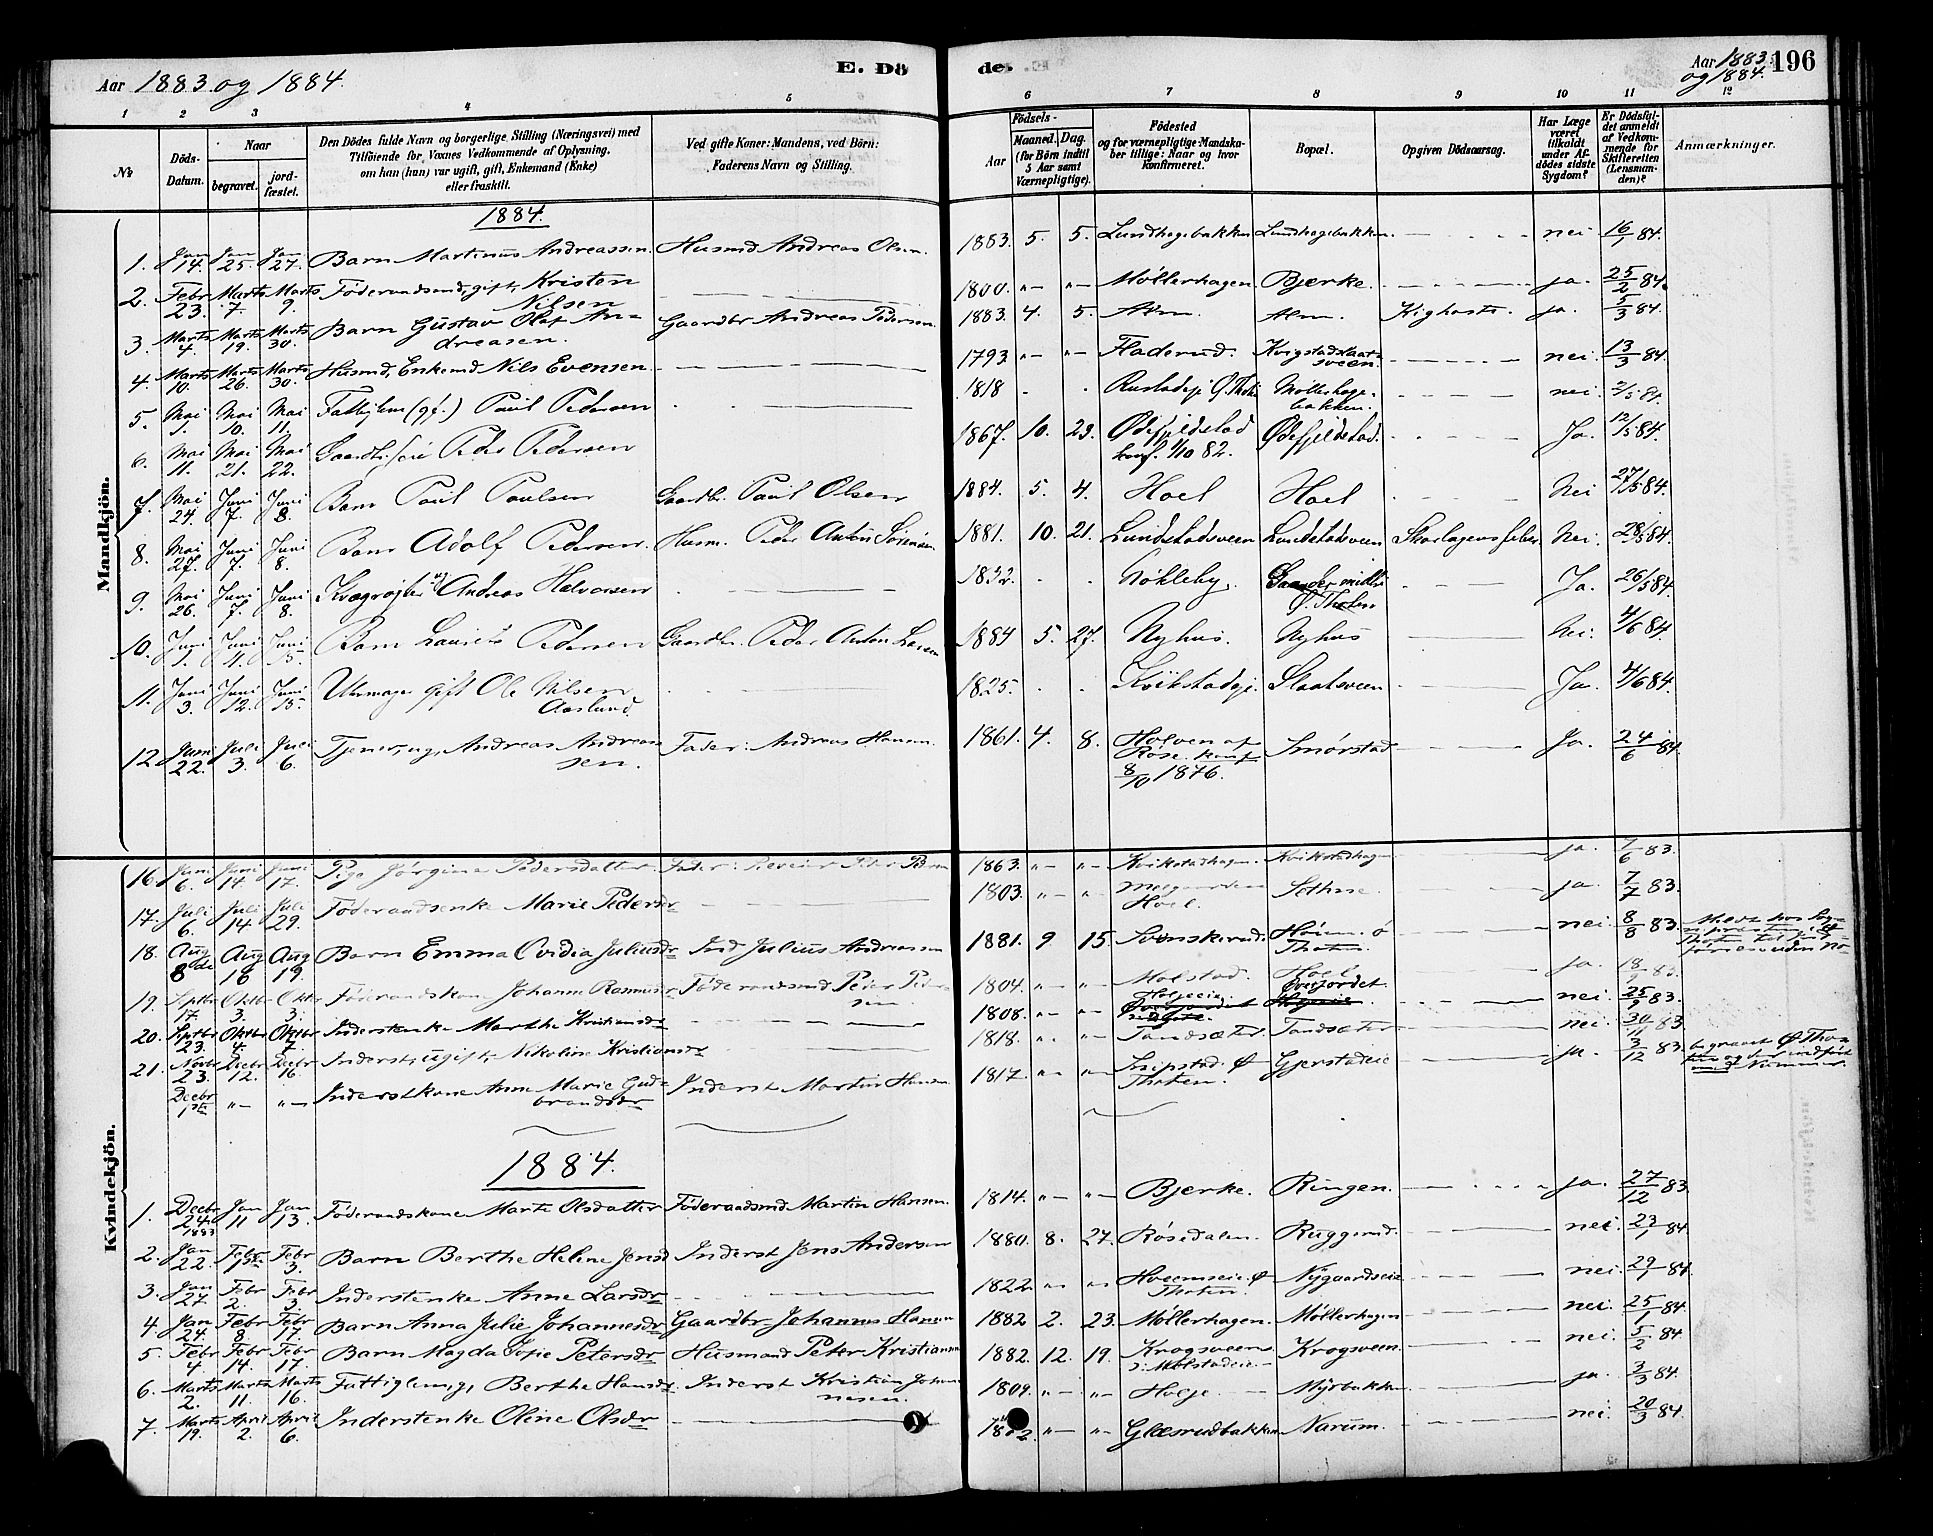 SAH, Vestre Toten prestekontor, H/Ha/Haa/L0010: Ministerialbok nr. 10, 1878-1894, s. 196